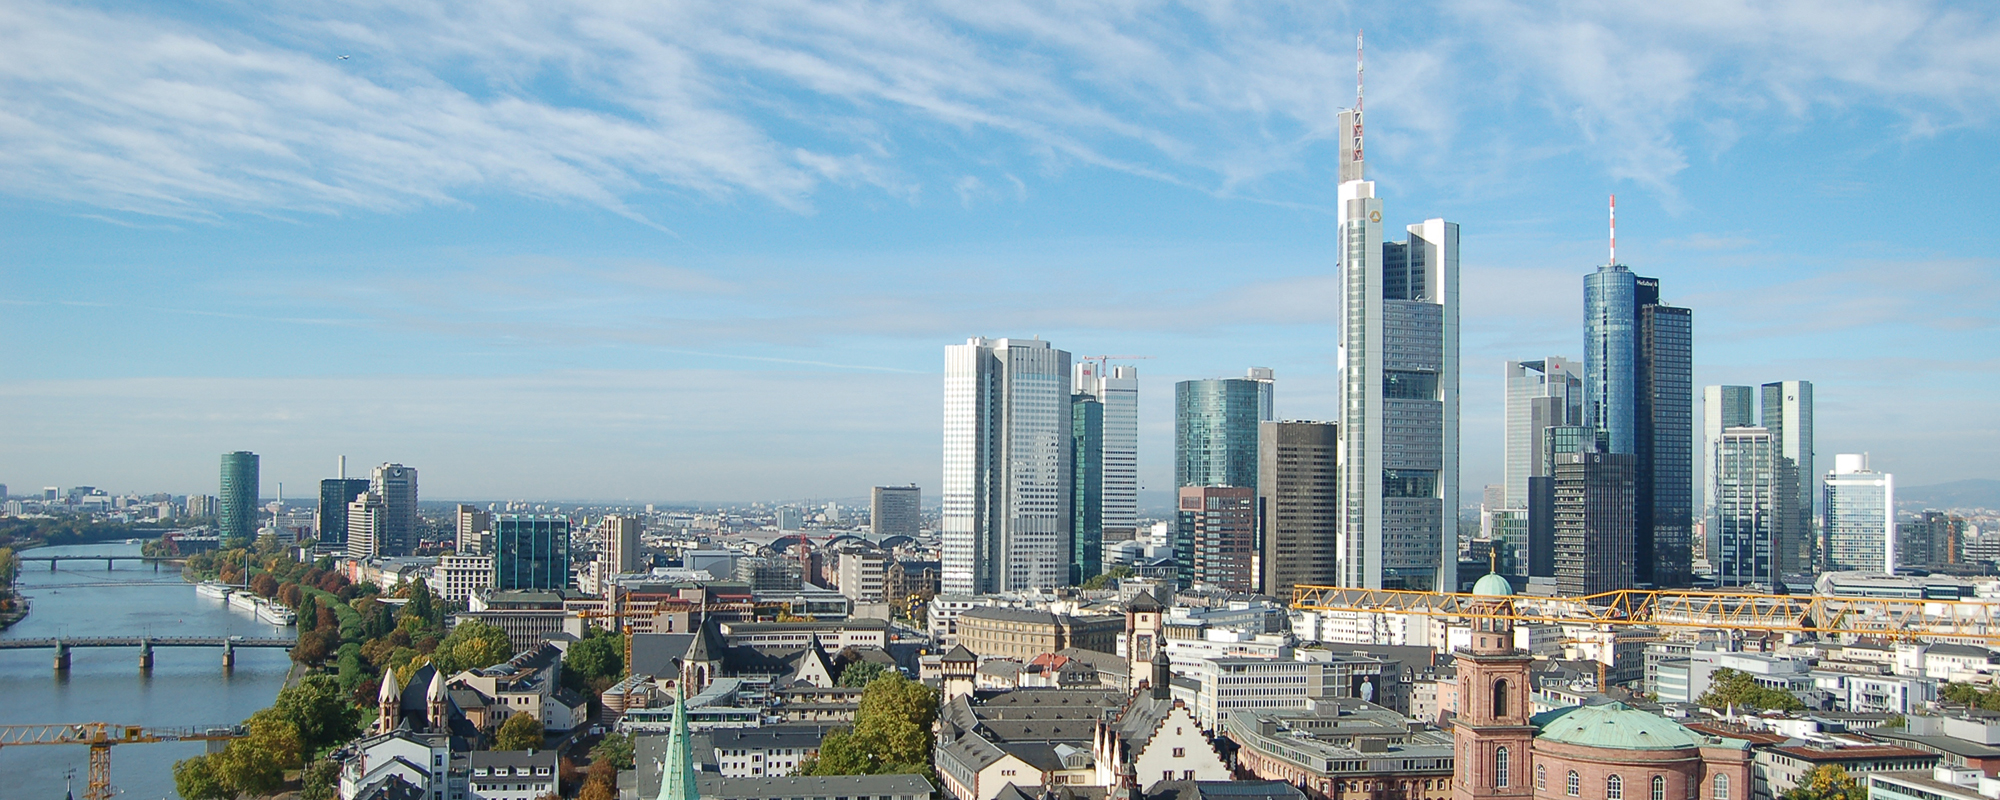 Panoramabild Skyline Frankfurt am Main